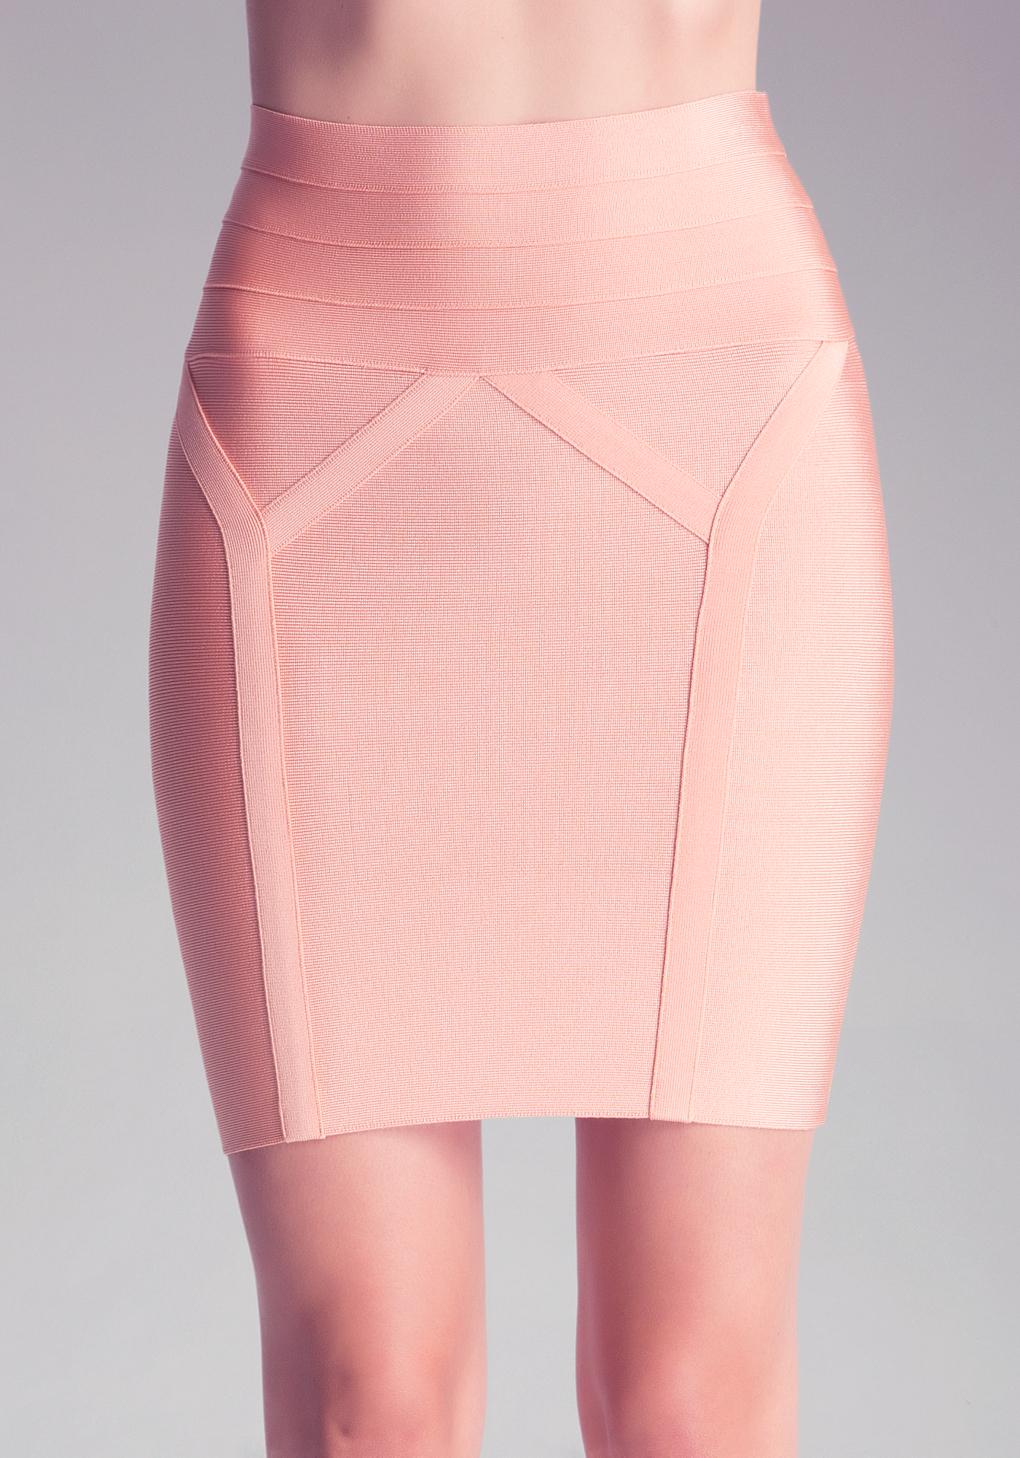 Bebe High Waist Bodycon Skirt in Pink | Lyst